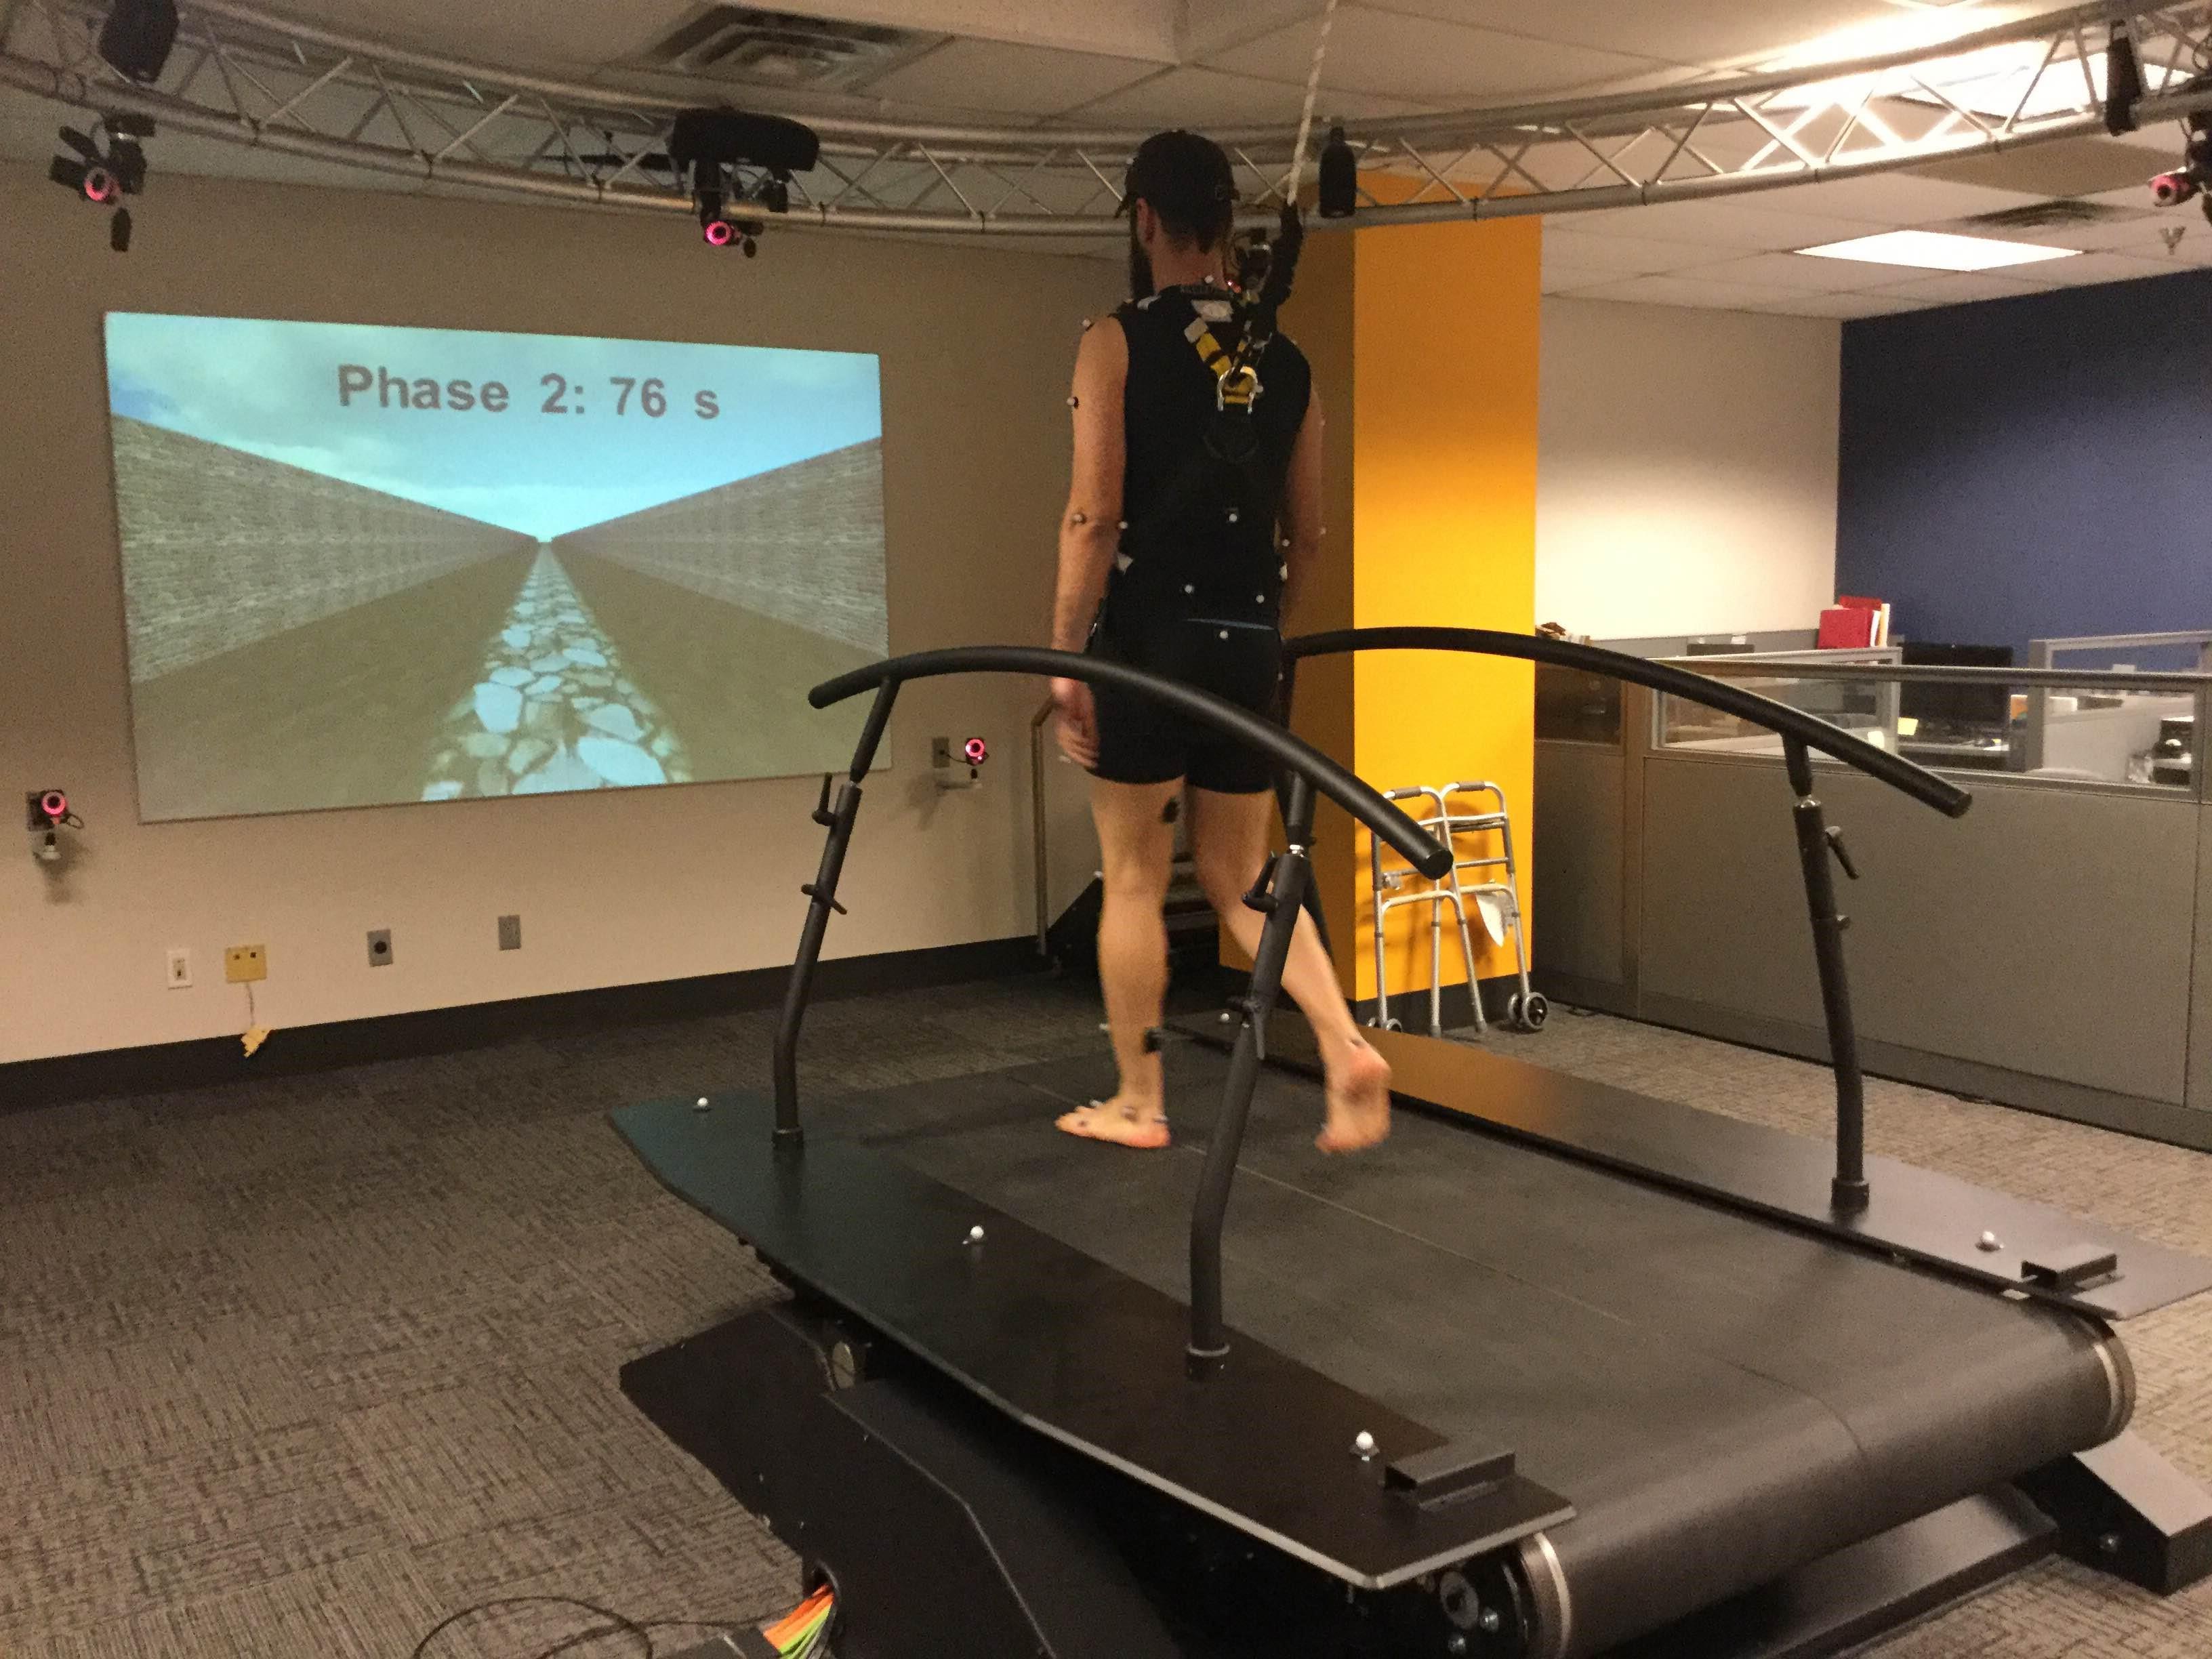 treadmill gait analysis